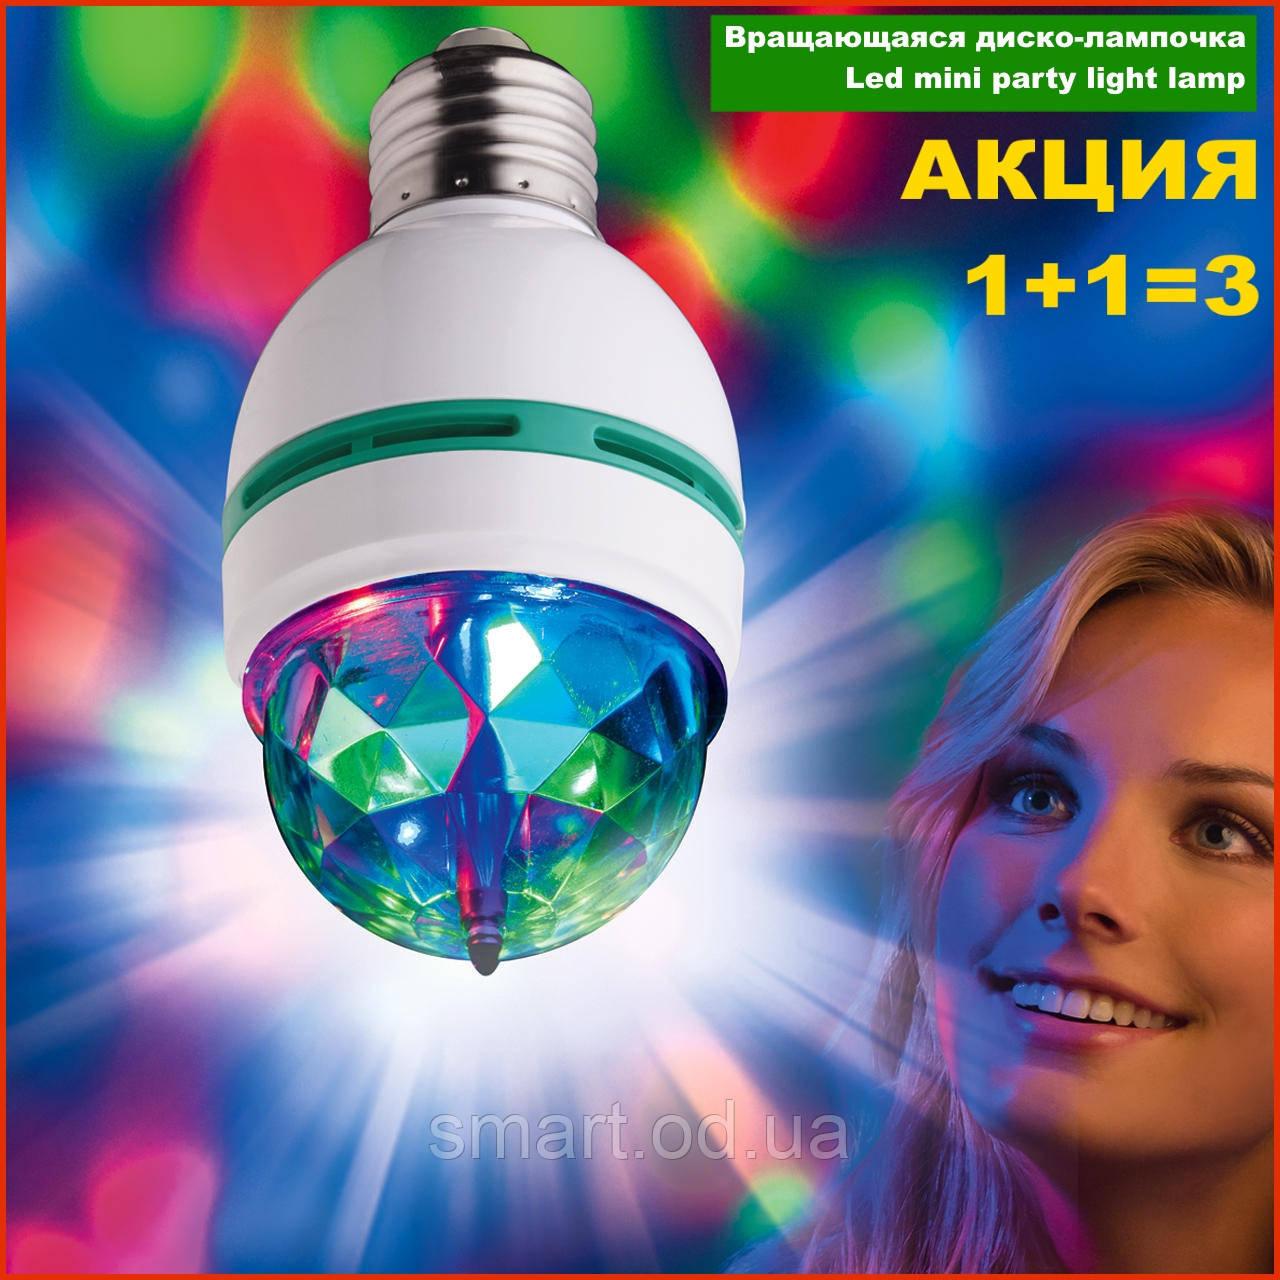 Карнавальна обертається диско лампочка хамелеон Led mini party light lamp гірлянда для святковий куля